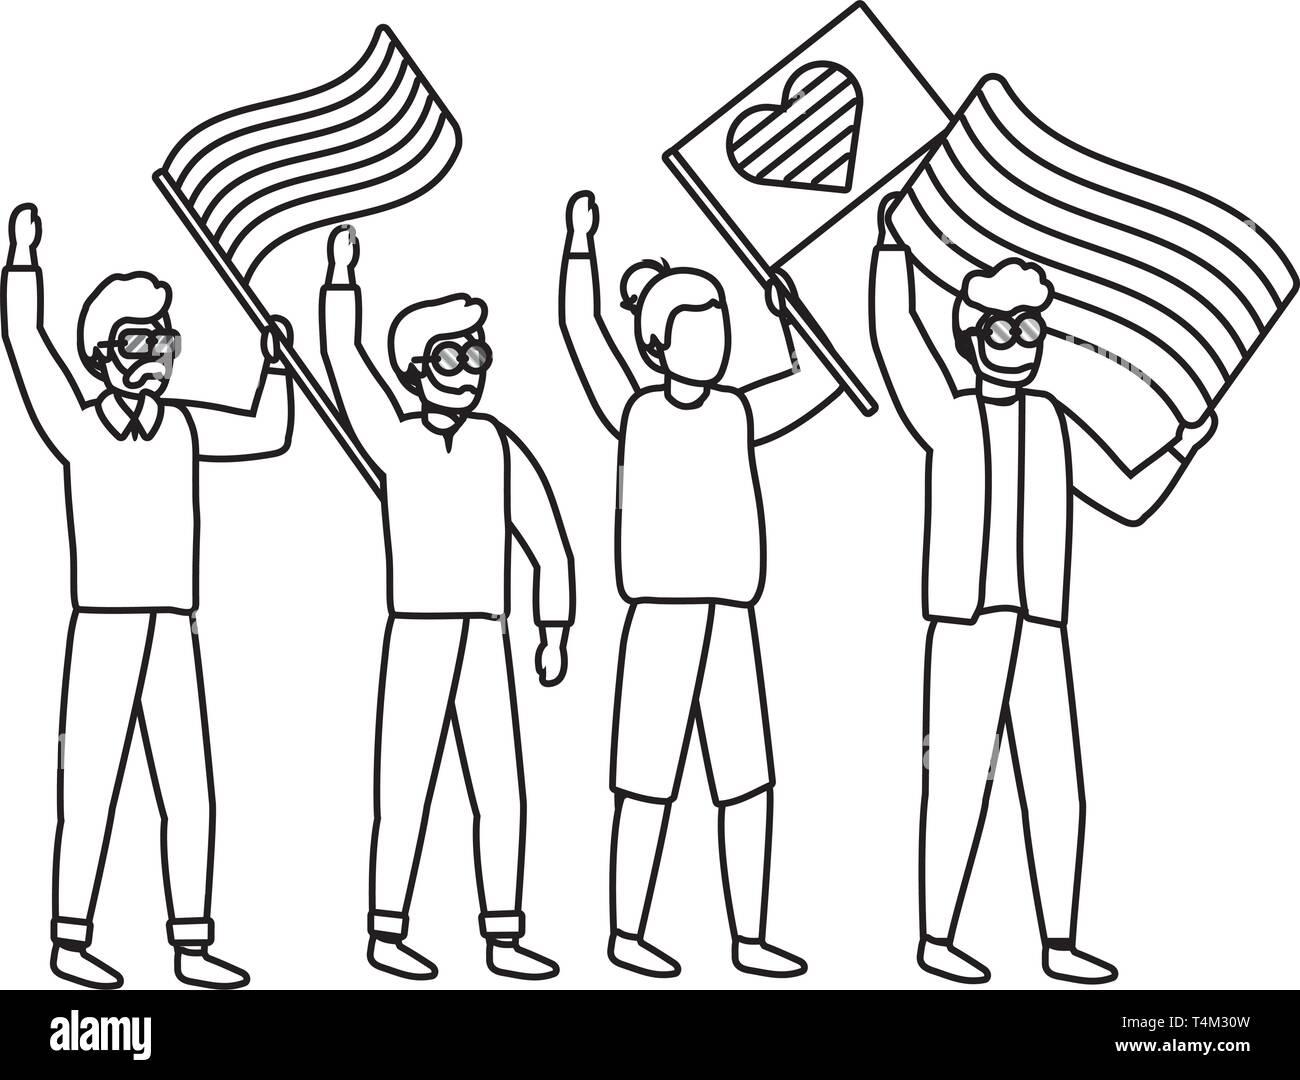 homosexual proud gay men at protest holding lgtbi flag cartoon vector illustration graphic design Stock Vector